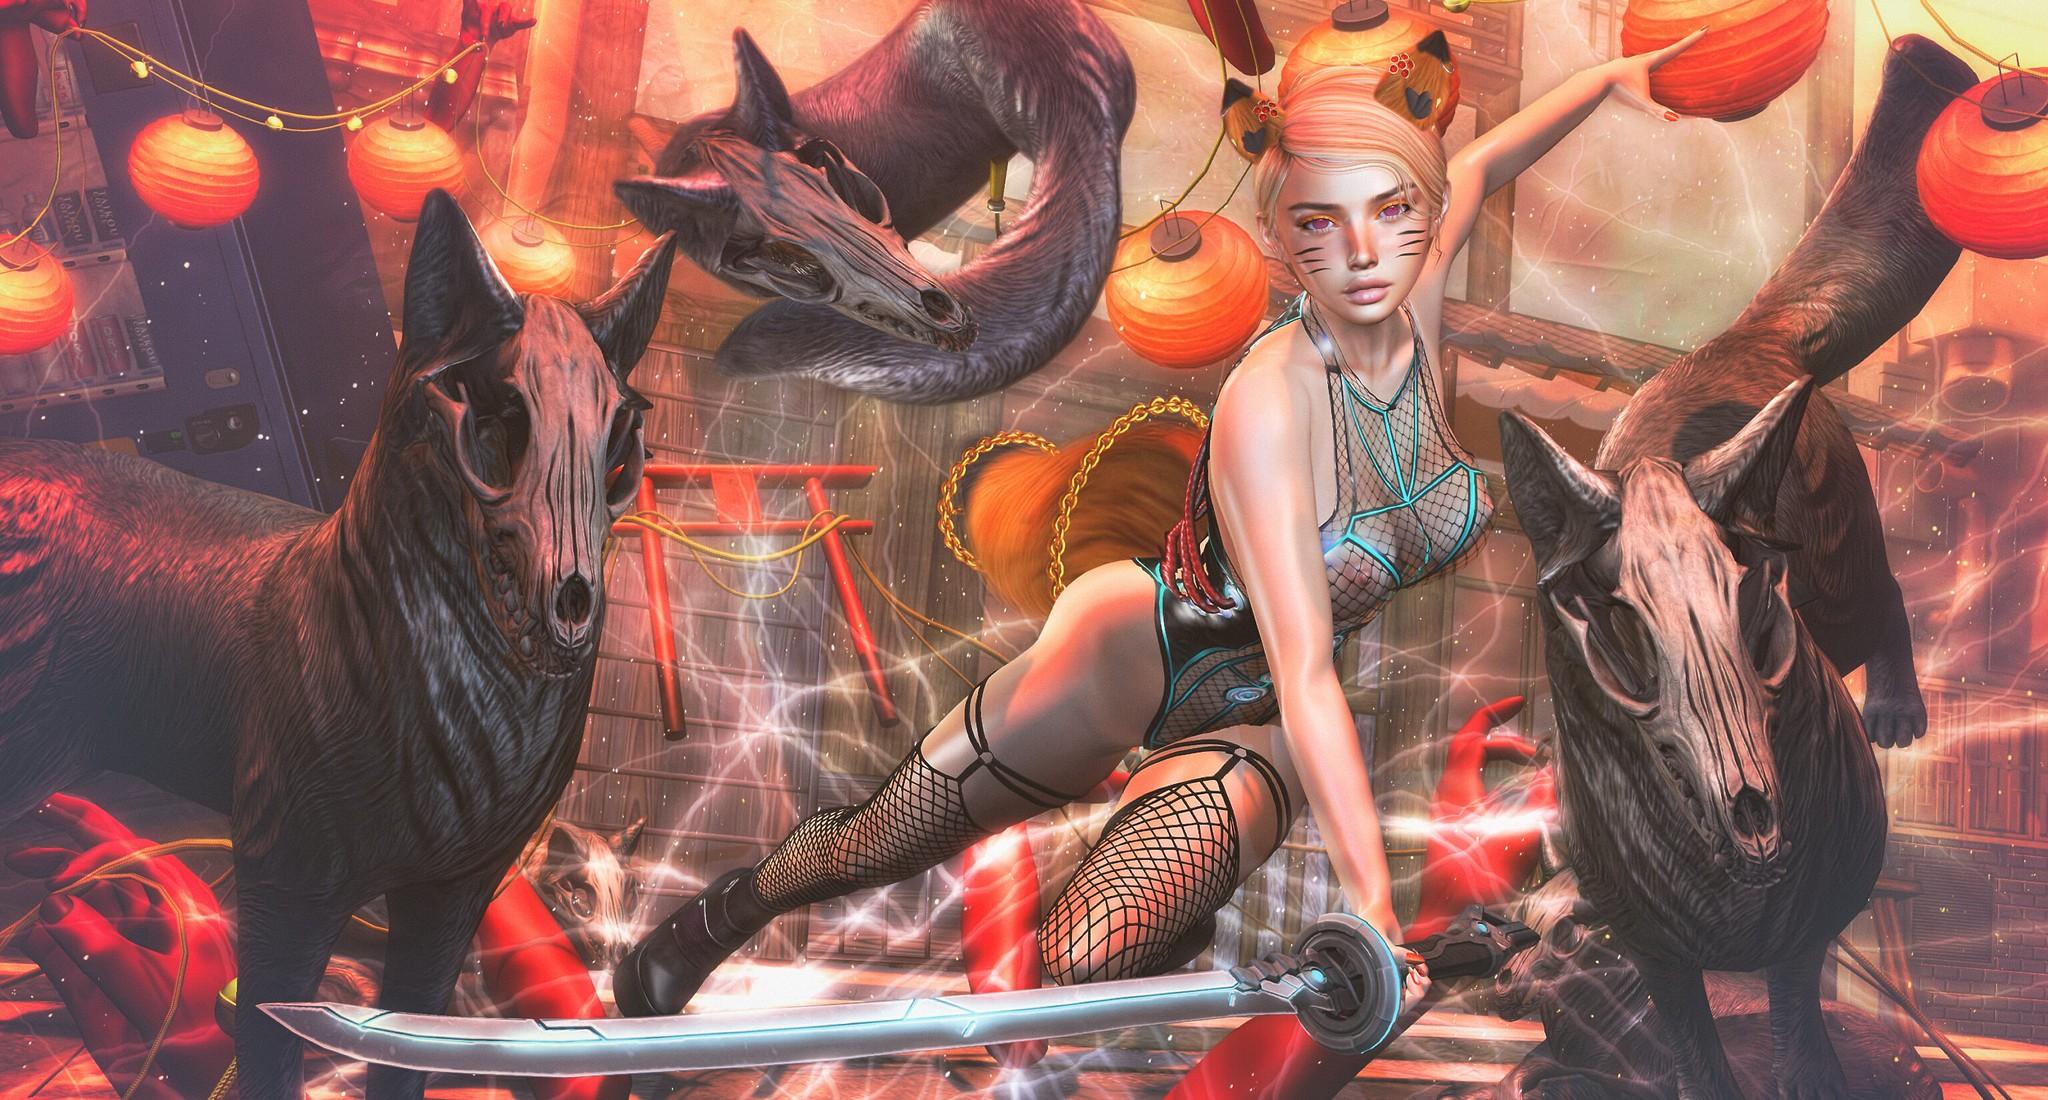 2020 0521 The Forge@ACCESS | Wicca's Originals@ROMP | Enchantment - ANDORE & Poseidon | Harajuku